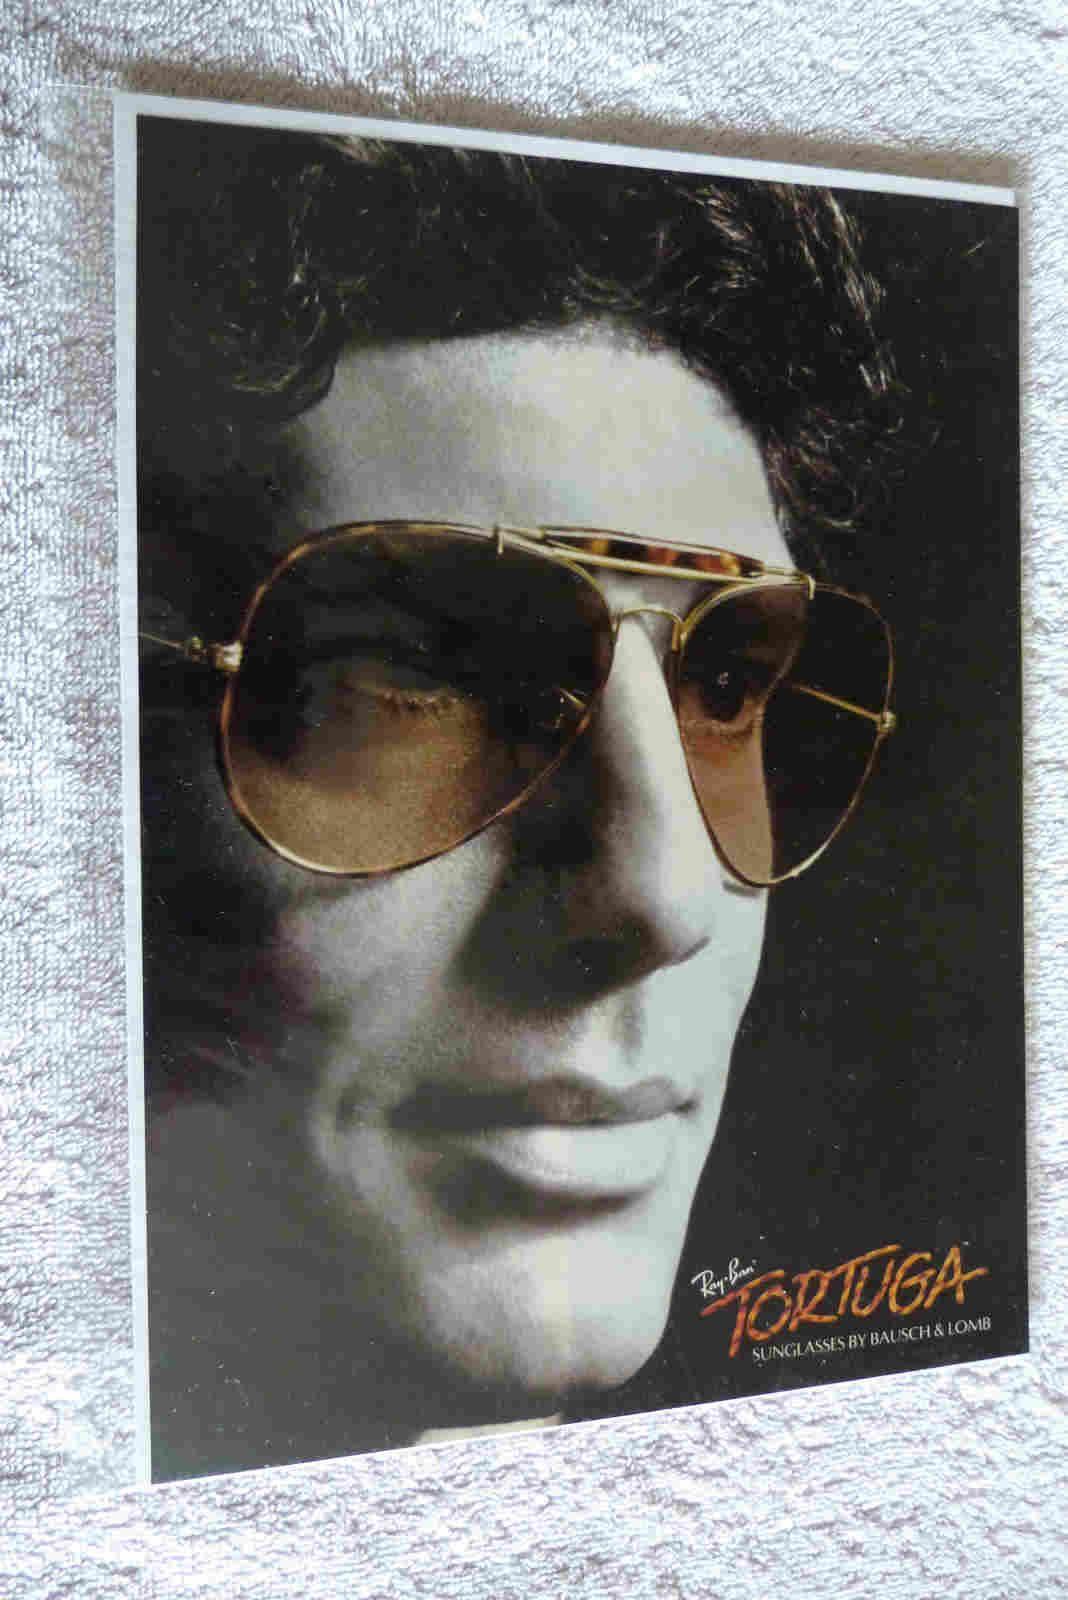 314bf0d61f4 1985 Vintage Ray Ban tortuga ad